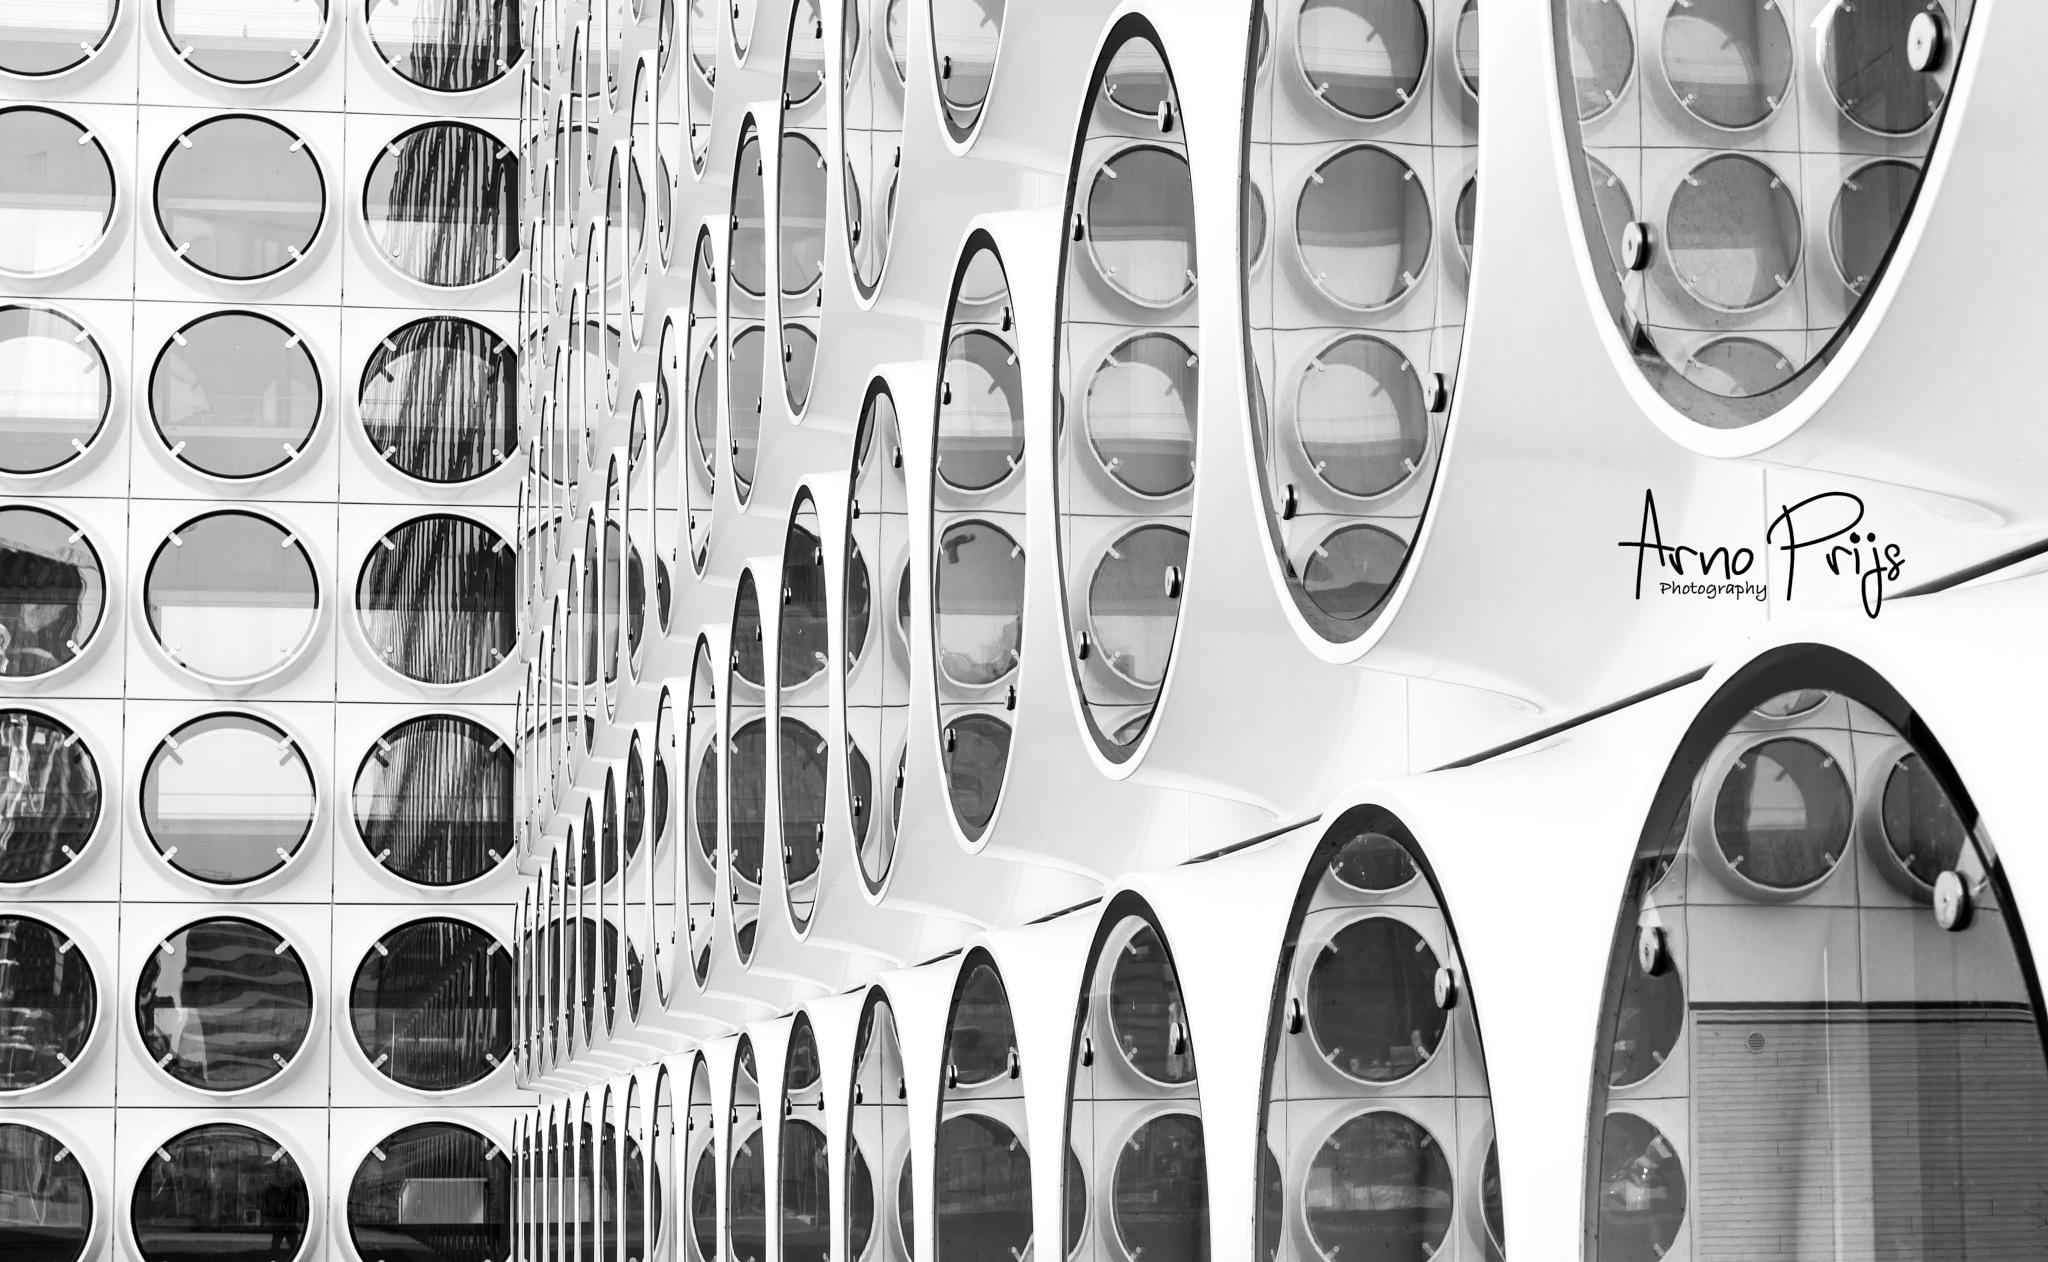 Reflectie Ravel Residence by Arno Prijs